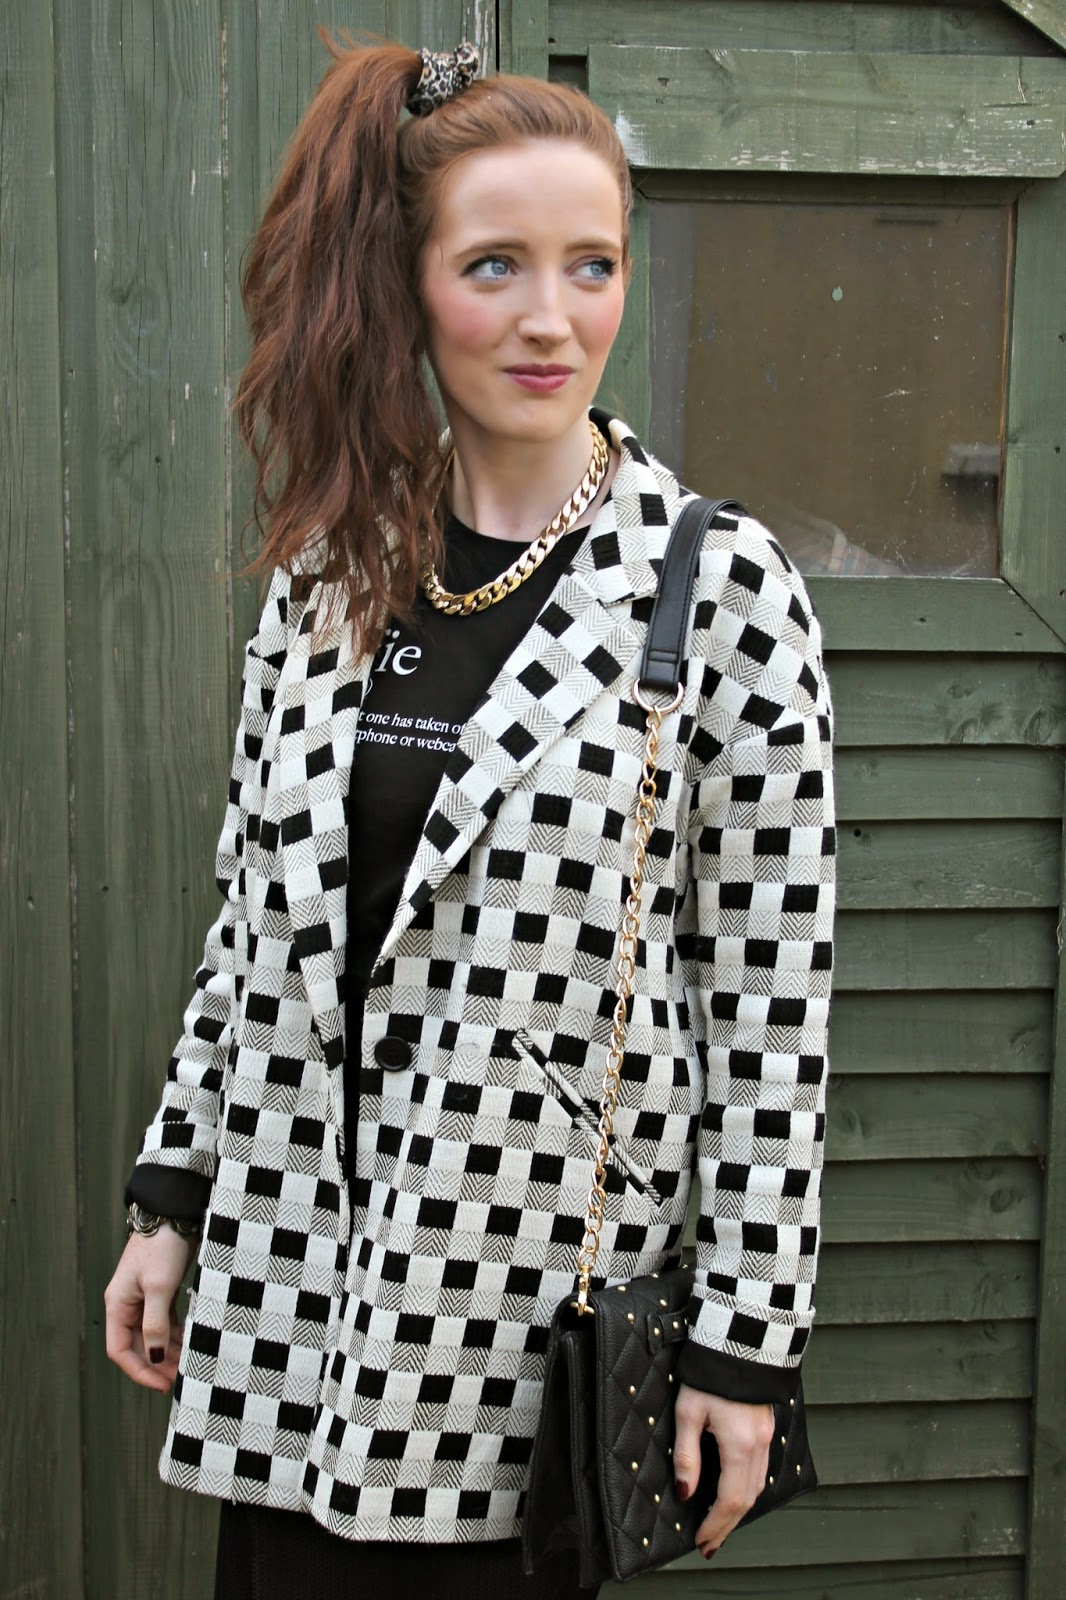 Bec Boop fashion blogger Galway